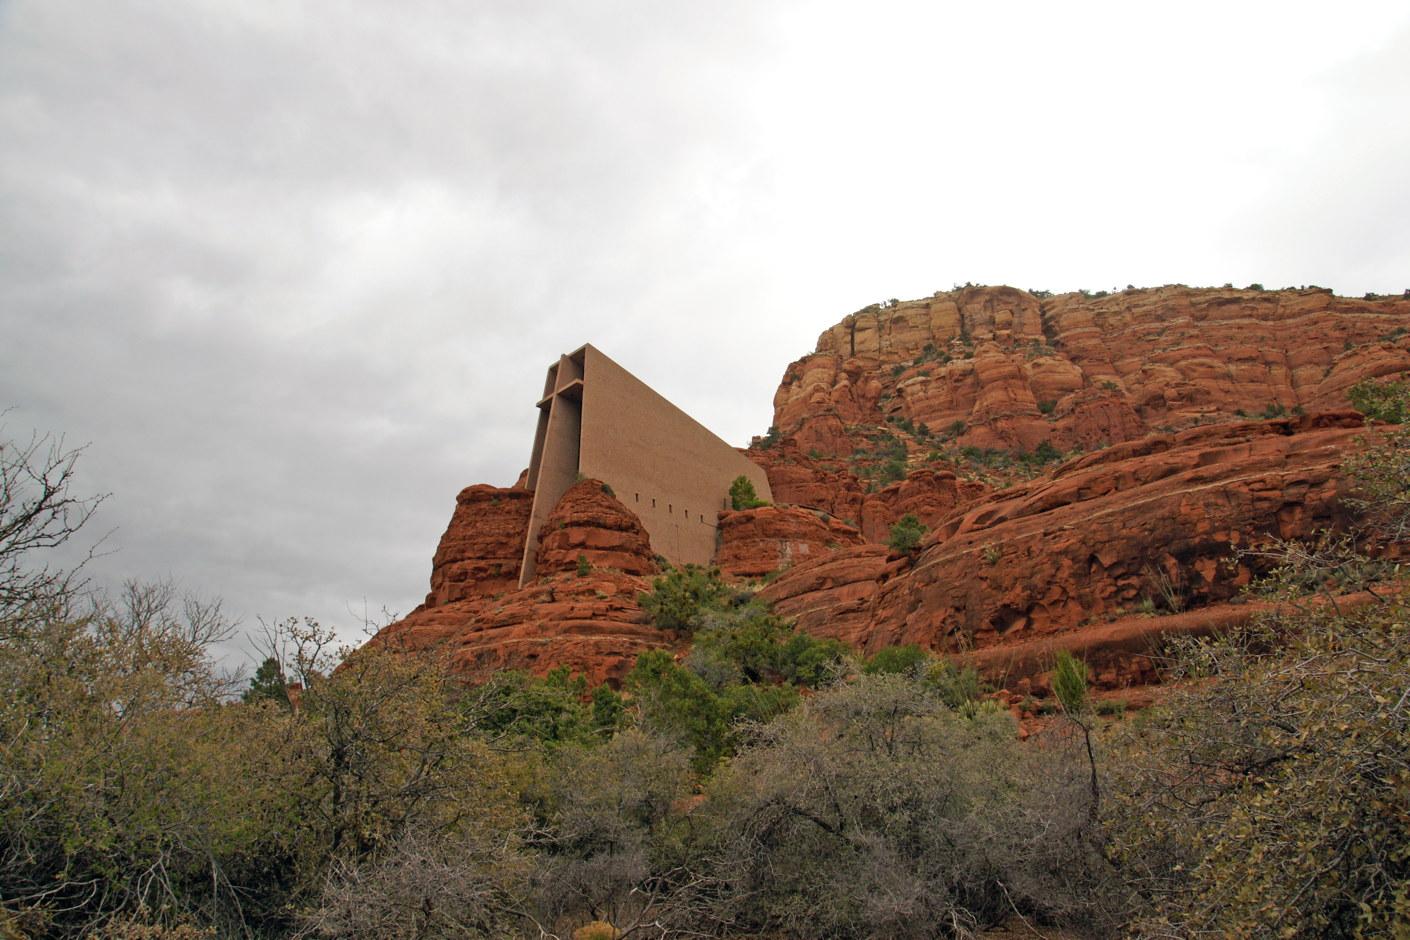 ac5d30e61 Arizona Road Trip - awa Travels